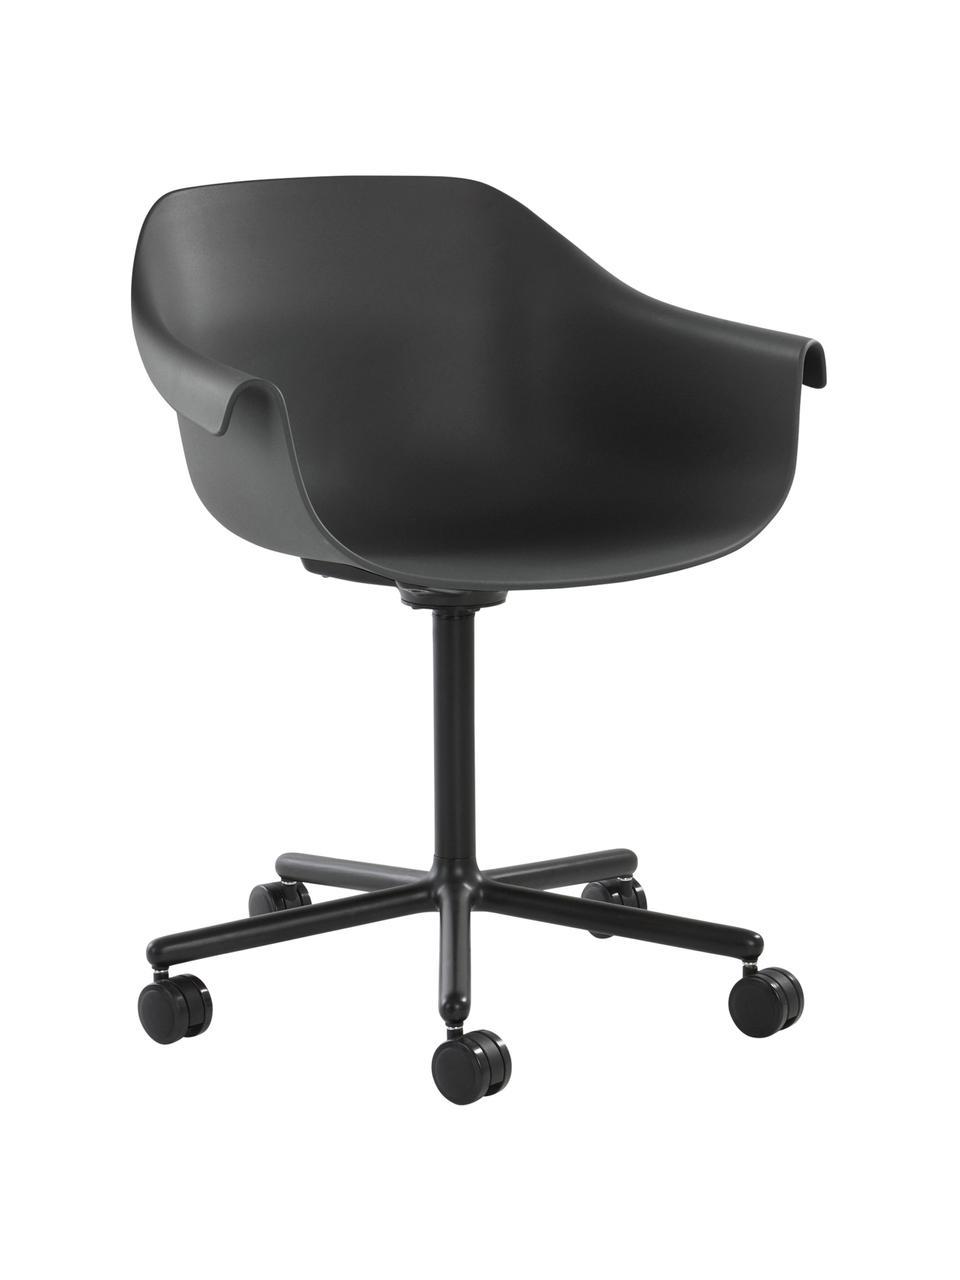 Bürodrehstuhl Warrington in Schwarz, Sitzfläche: Polypropylen, Gestell: Aluminium, Schwarz, B 57 x T 63 cm